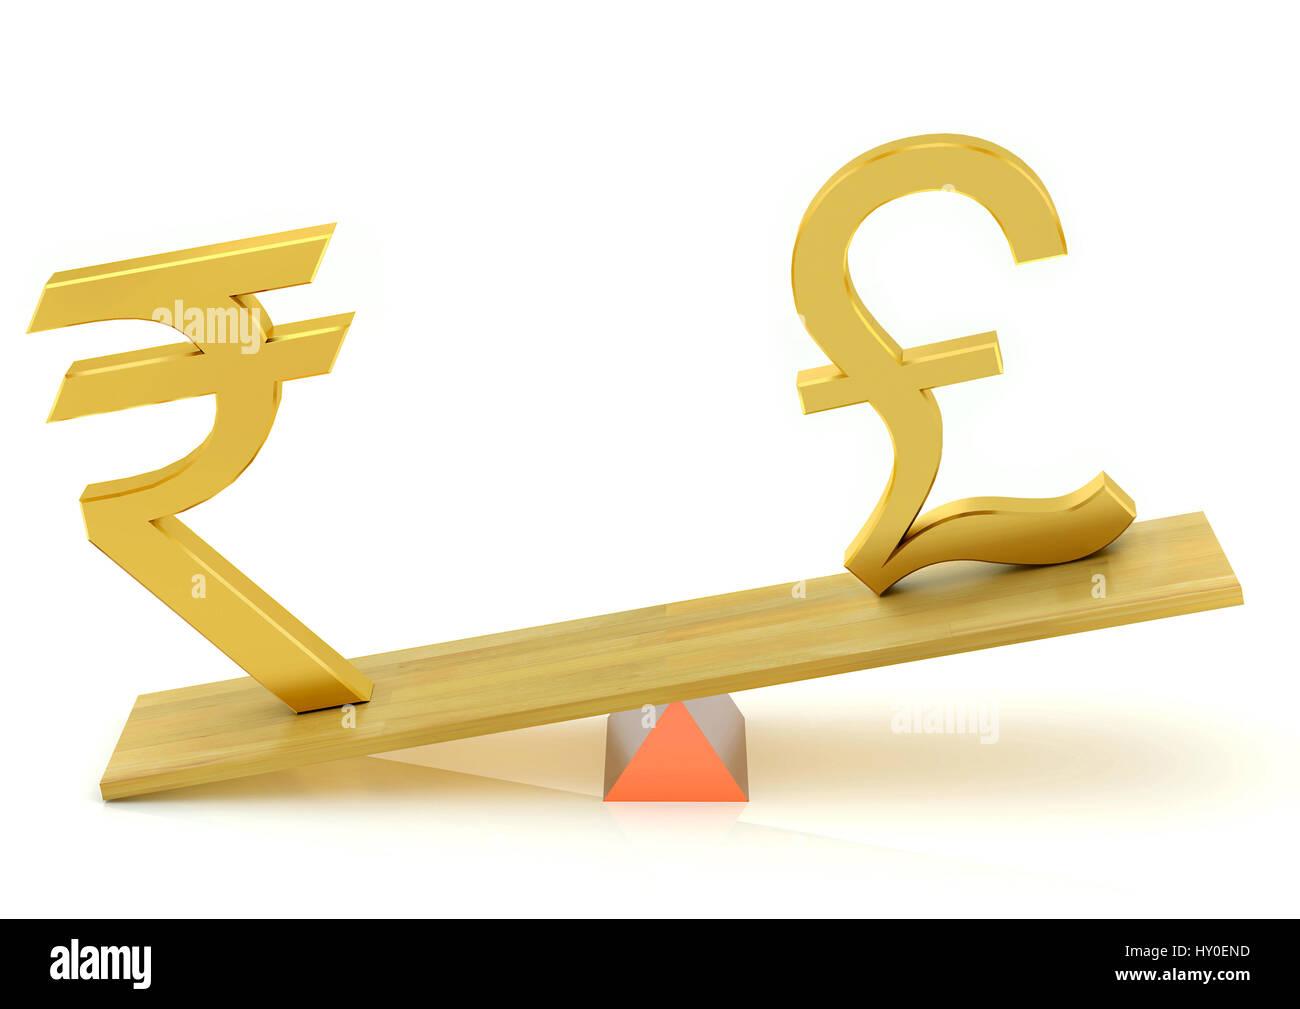 Balancing, indian rupee and british pound - Stock Image